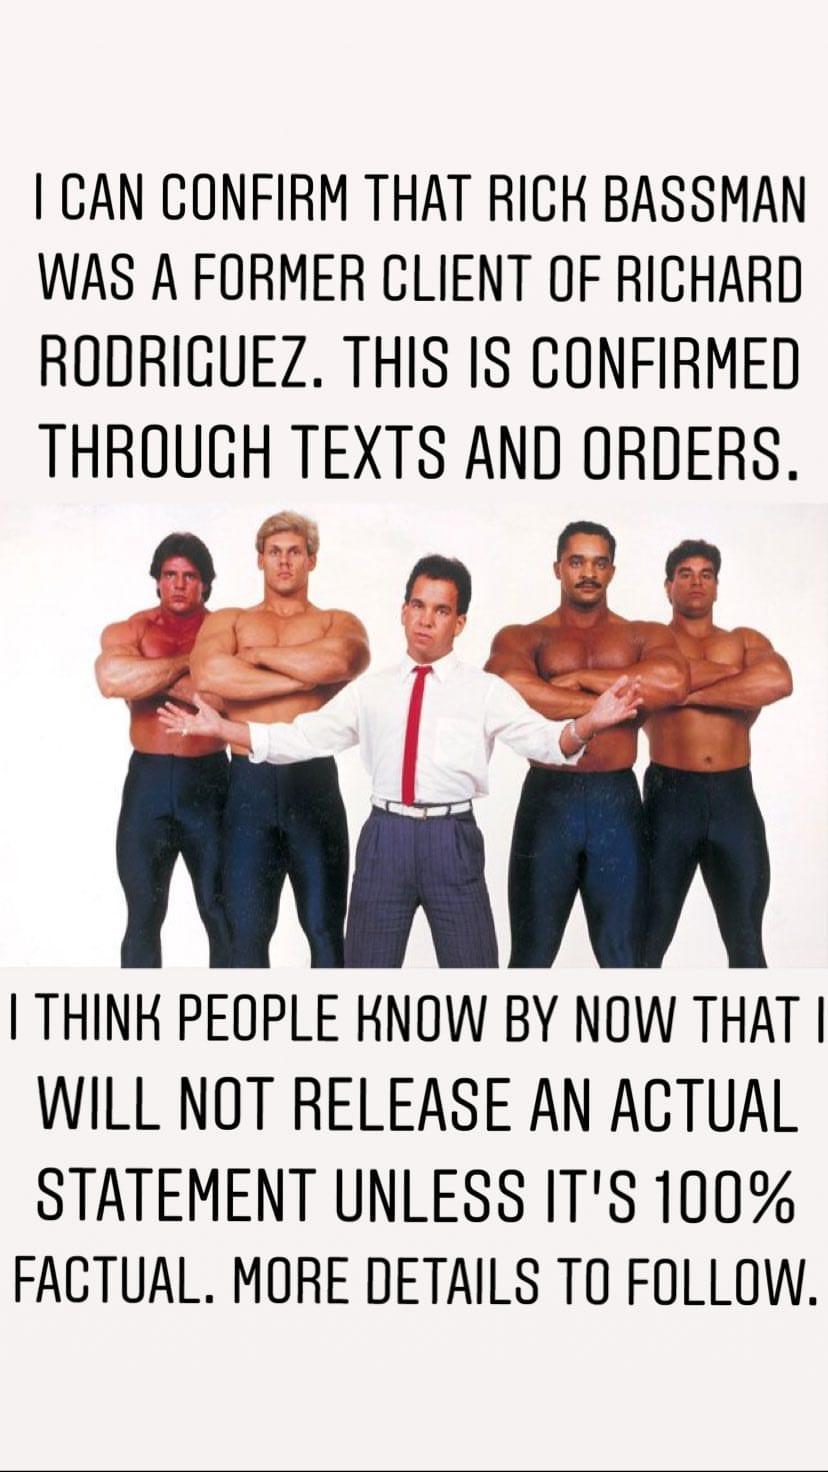 Jon Bravo confirms Rick Bassman was a former client of jailed steroid dealer Richard Rodriguez